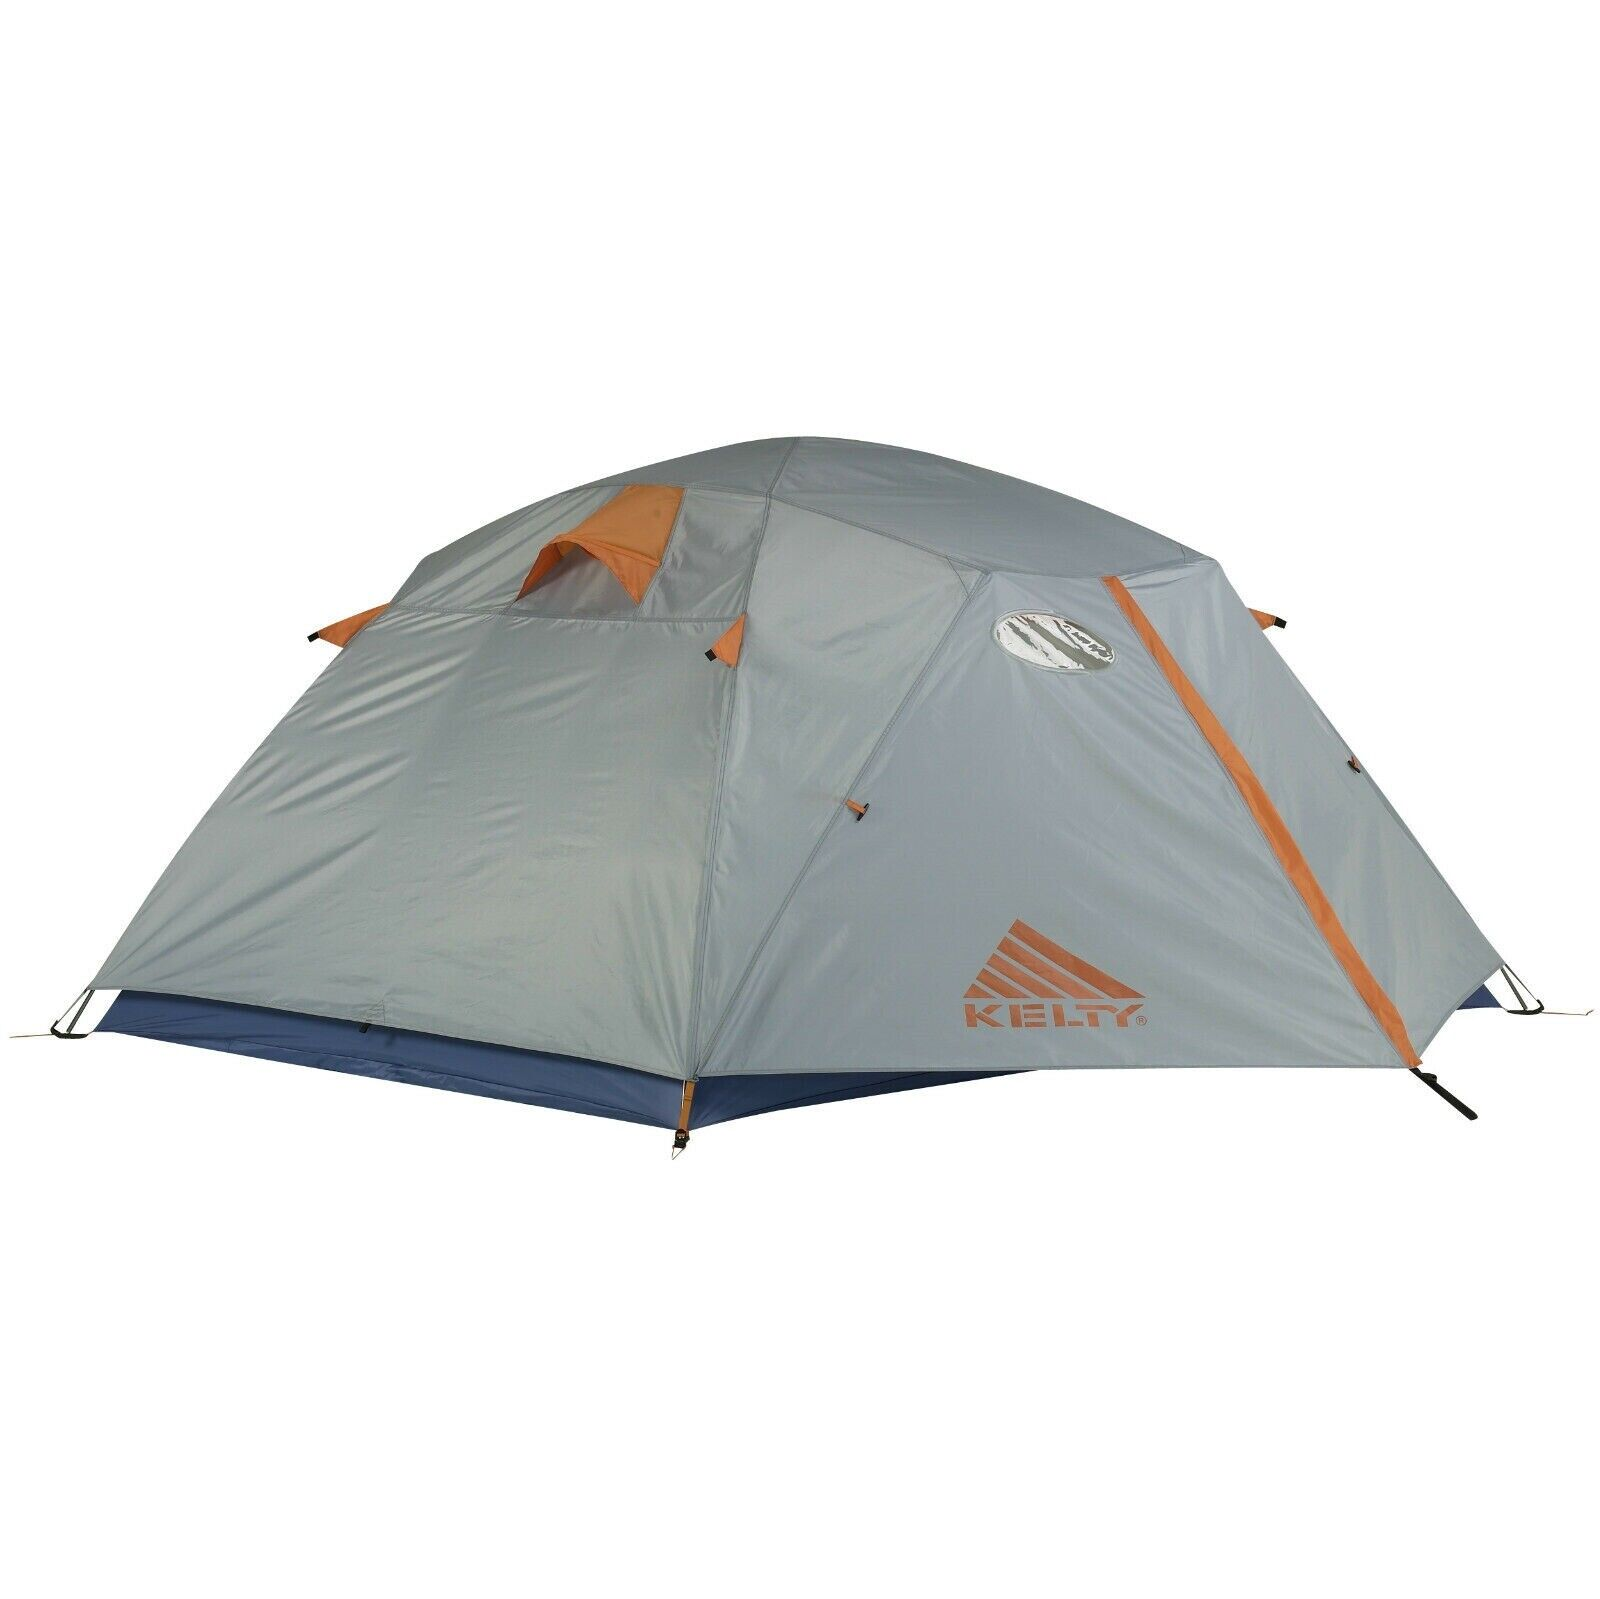 Kelty Vista 3, Lightweight 3 Person, 3 Seasons Family Tent, New RRP .99